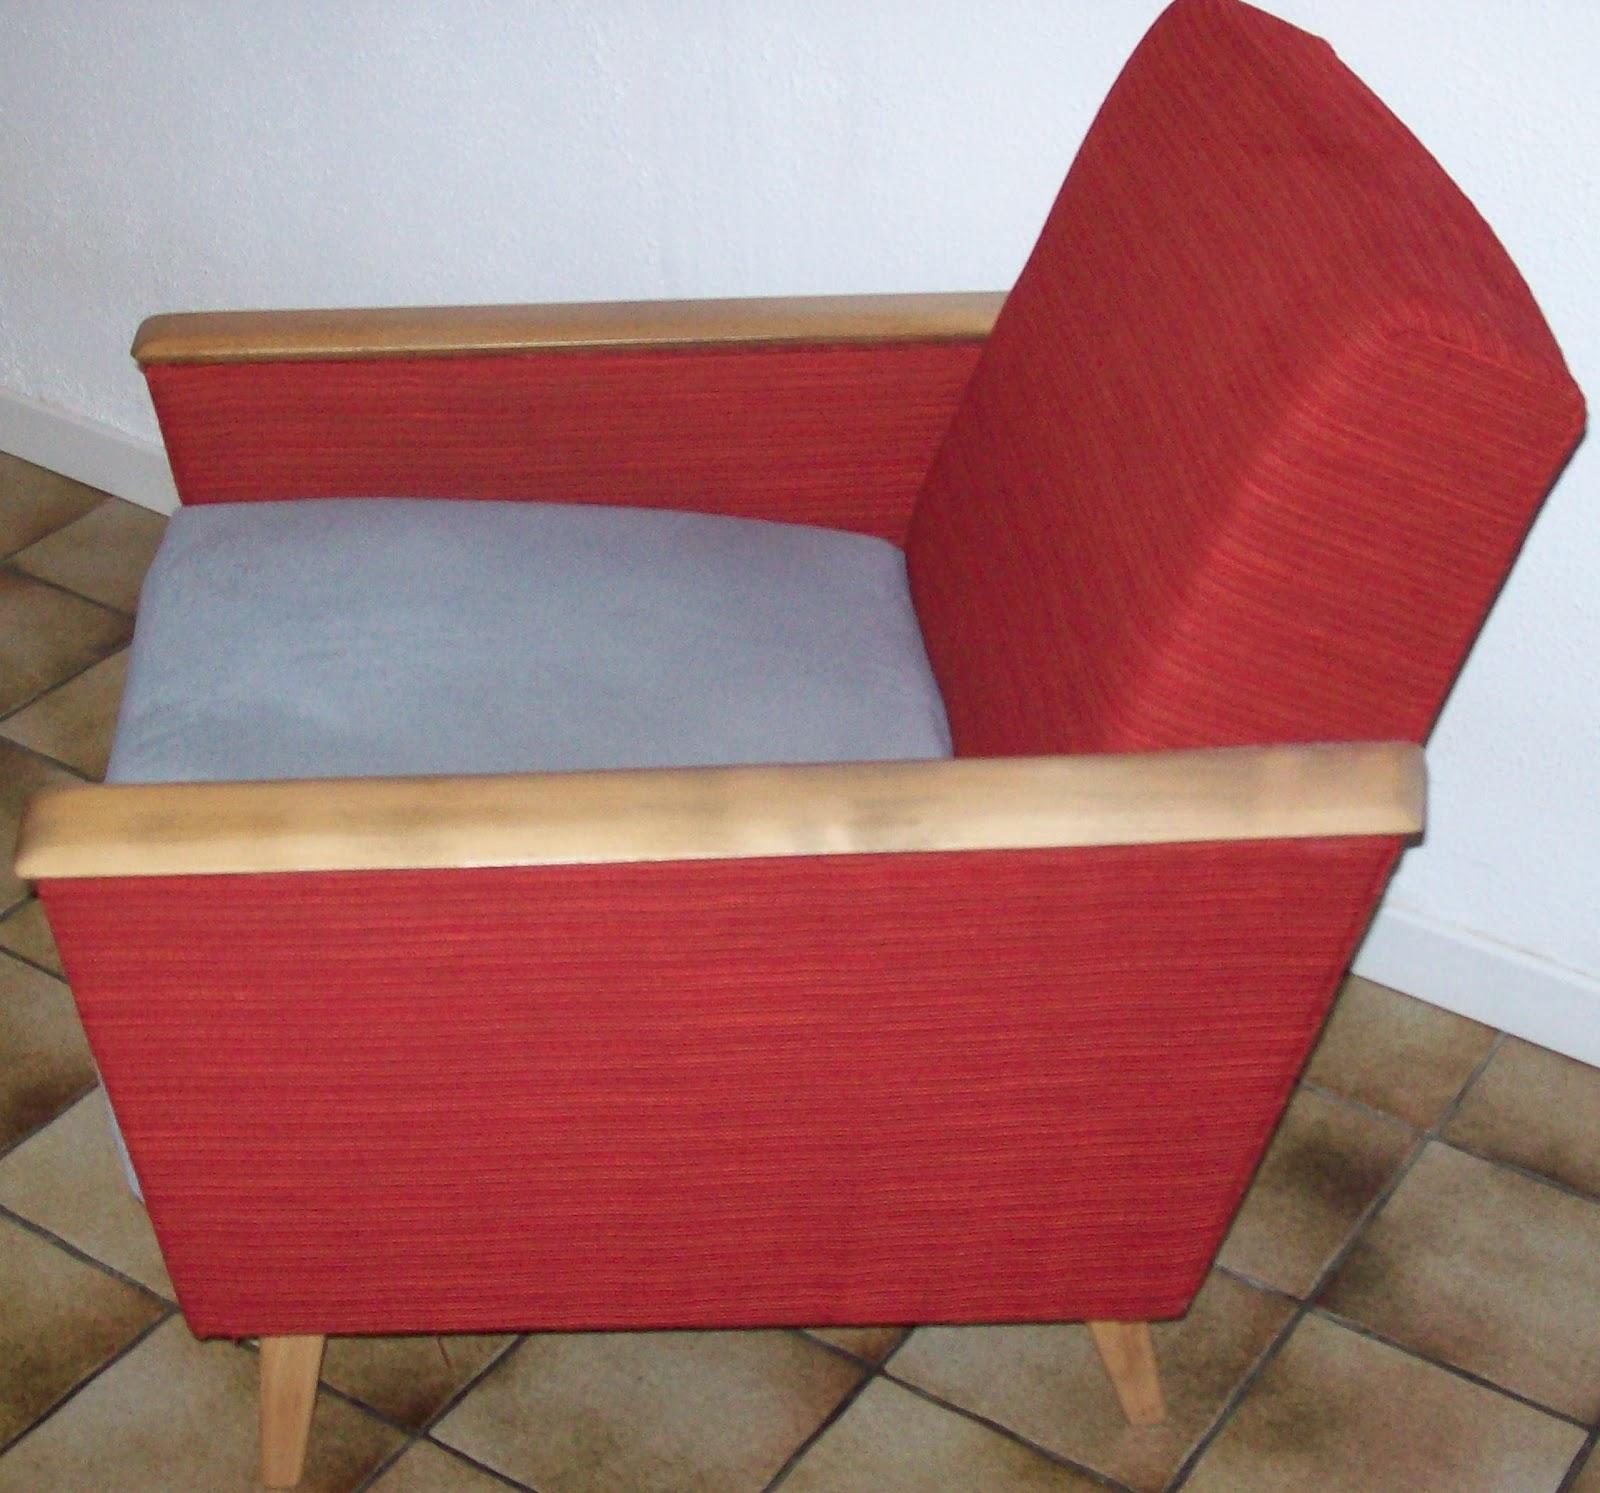 Bon coin fauteuil de salon - Cobinhood token price online